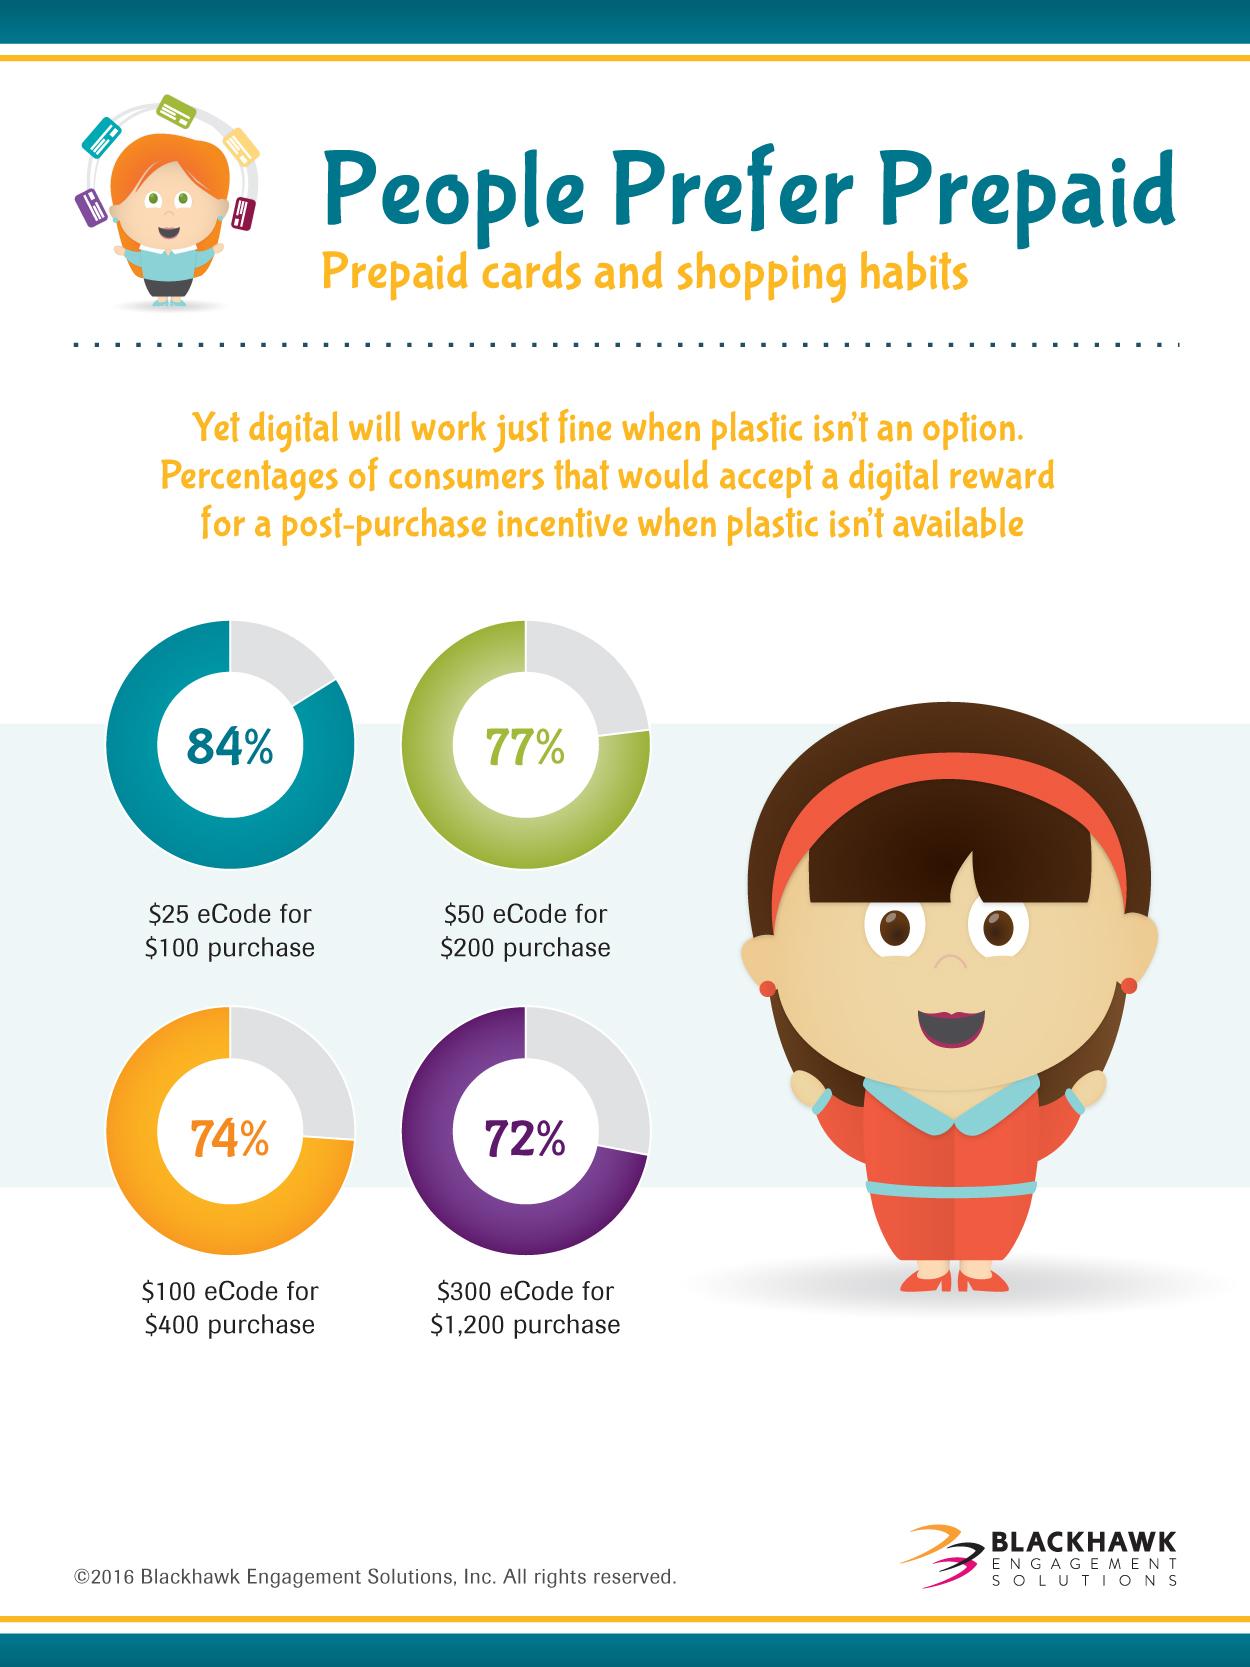 Digital prepaid is making progress and will work just fine when plastic isn't an option.